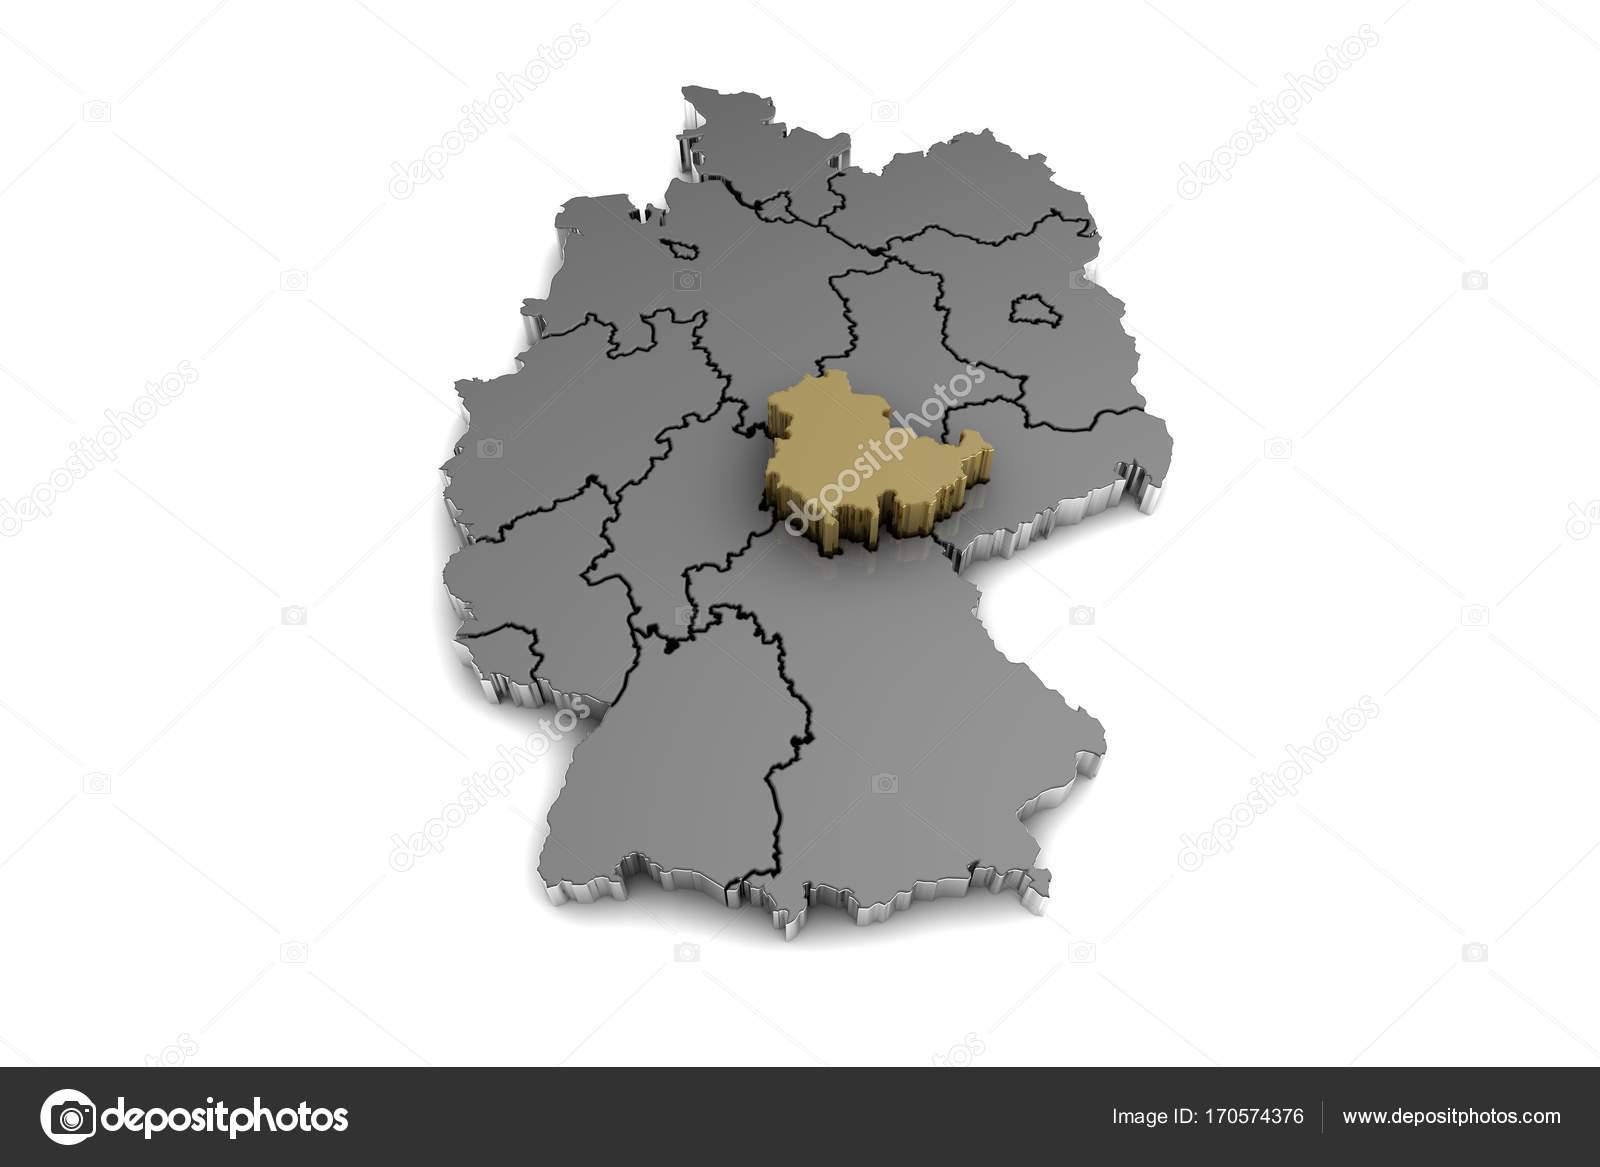 Carte Allemagne Thuringe.Allemagne Carte Avec La Region De Thuringe A Mis En Evidence Dans